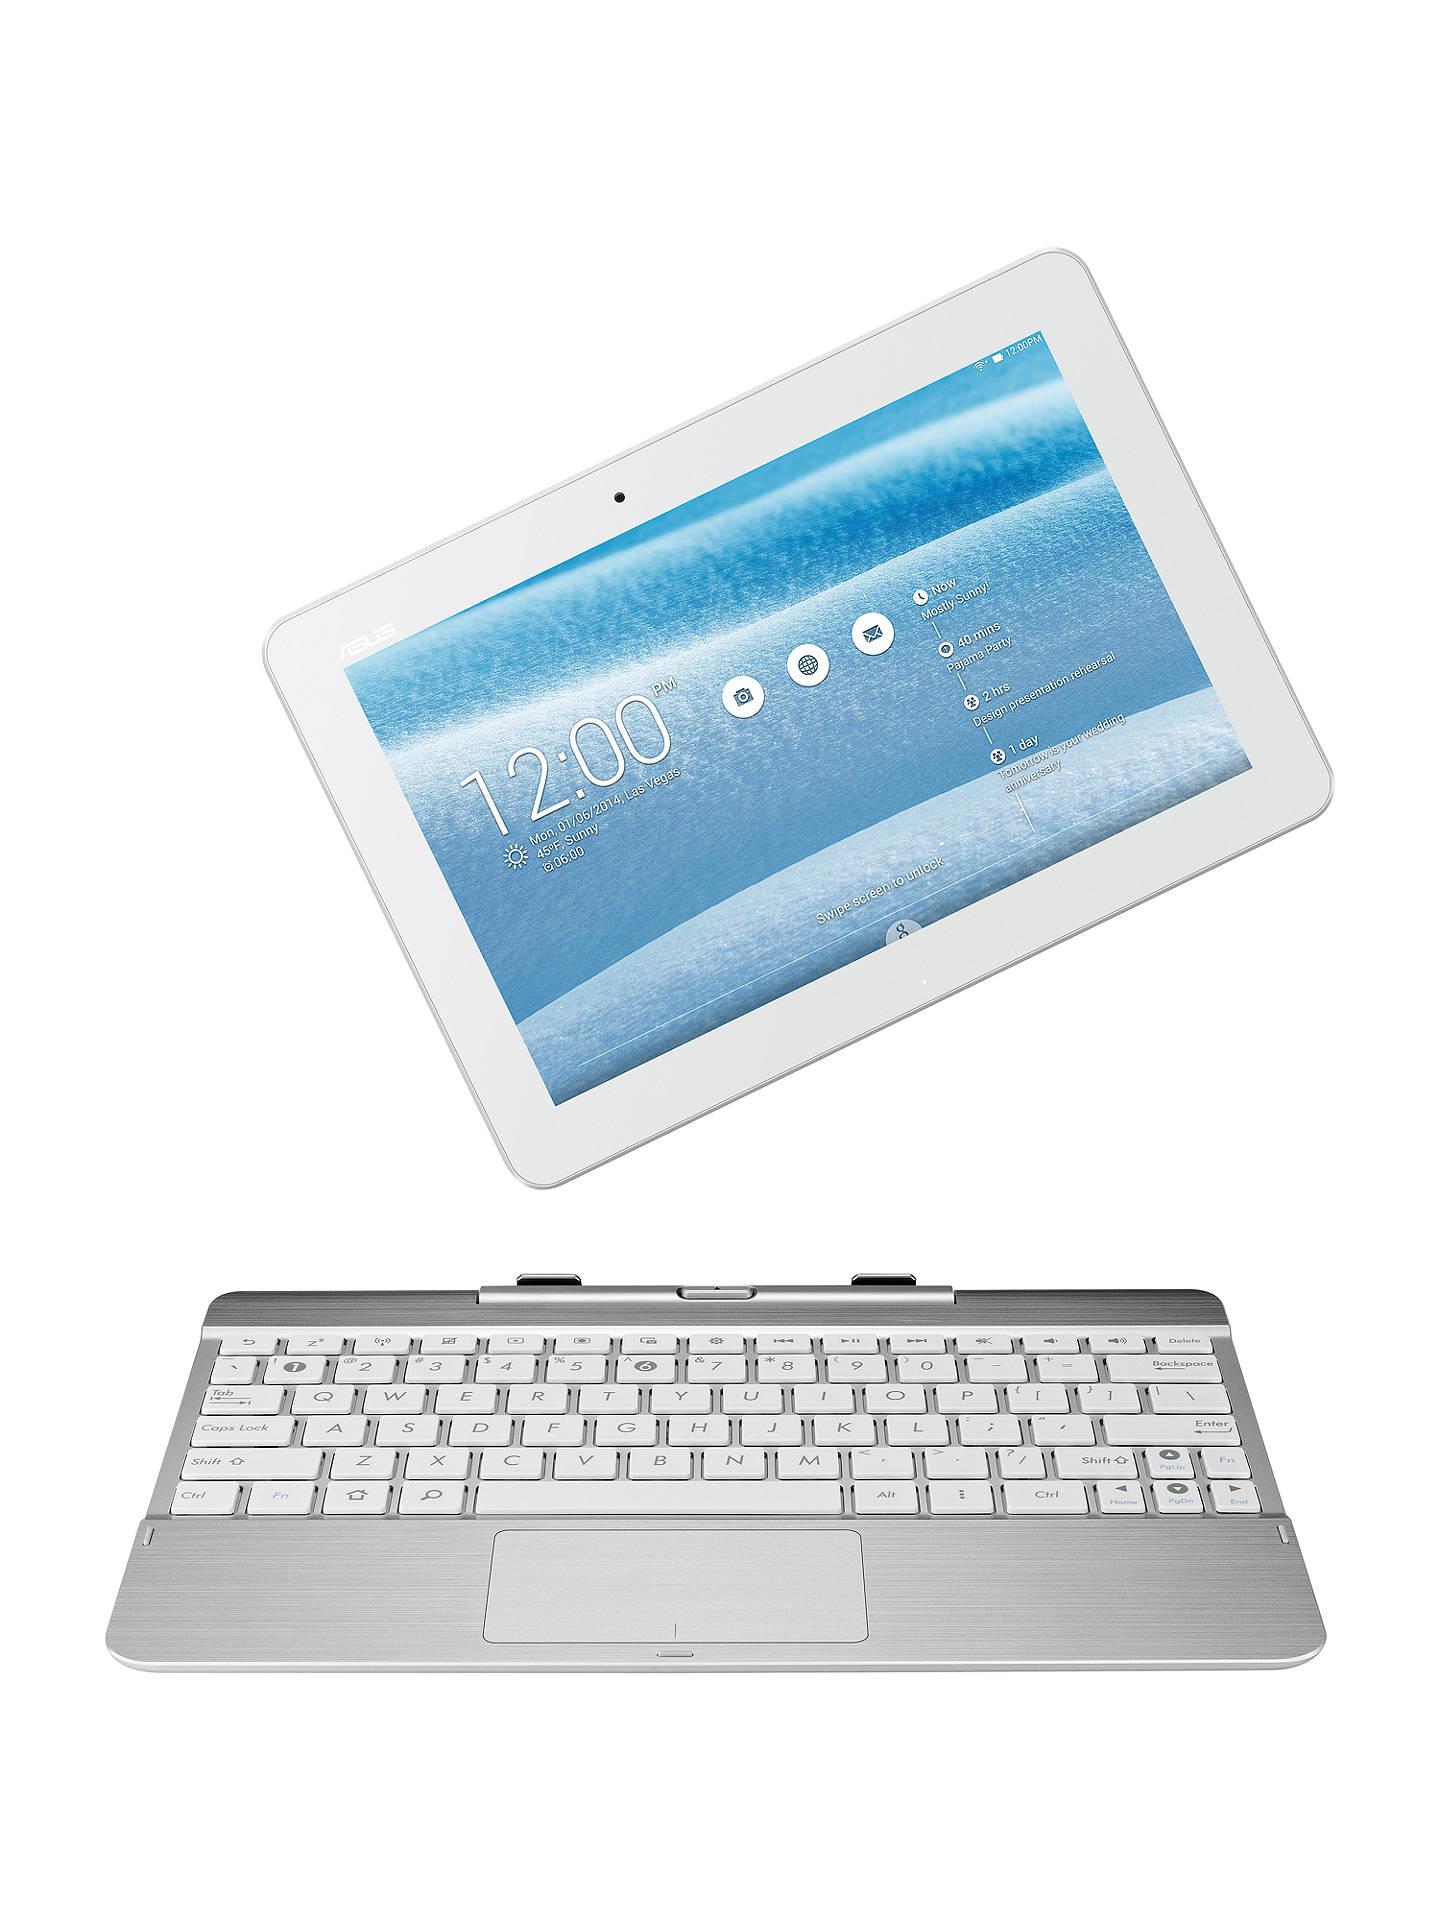 ASUS Transformer Pad TF103C Tablet & Keyboard Dock, Intel Atom